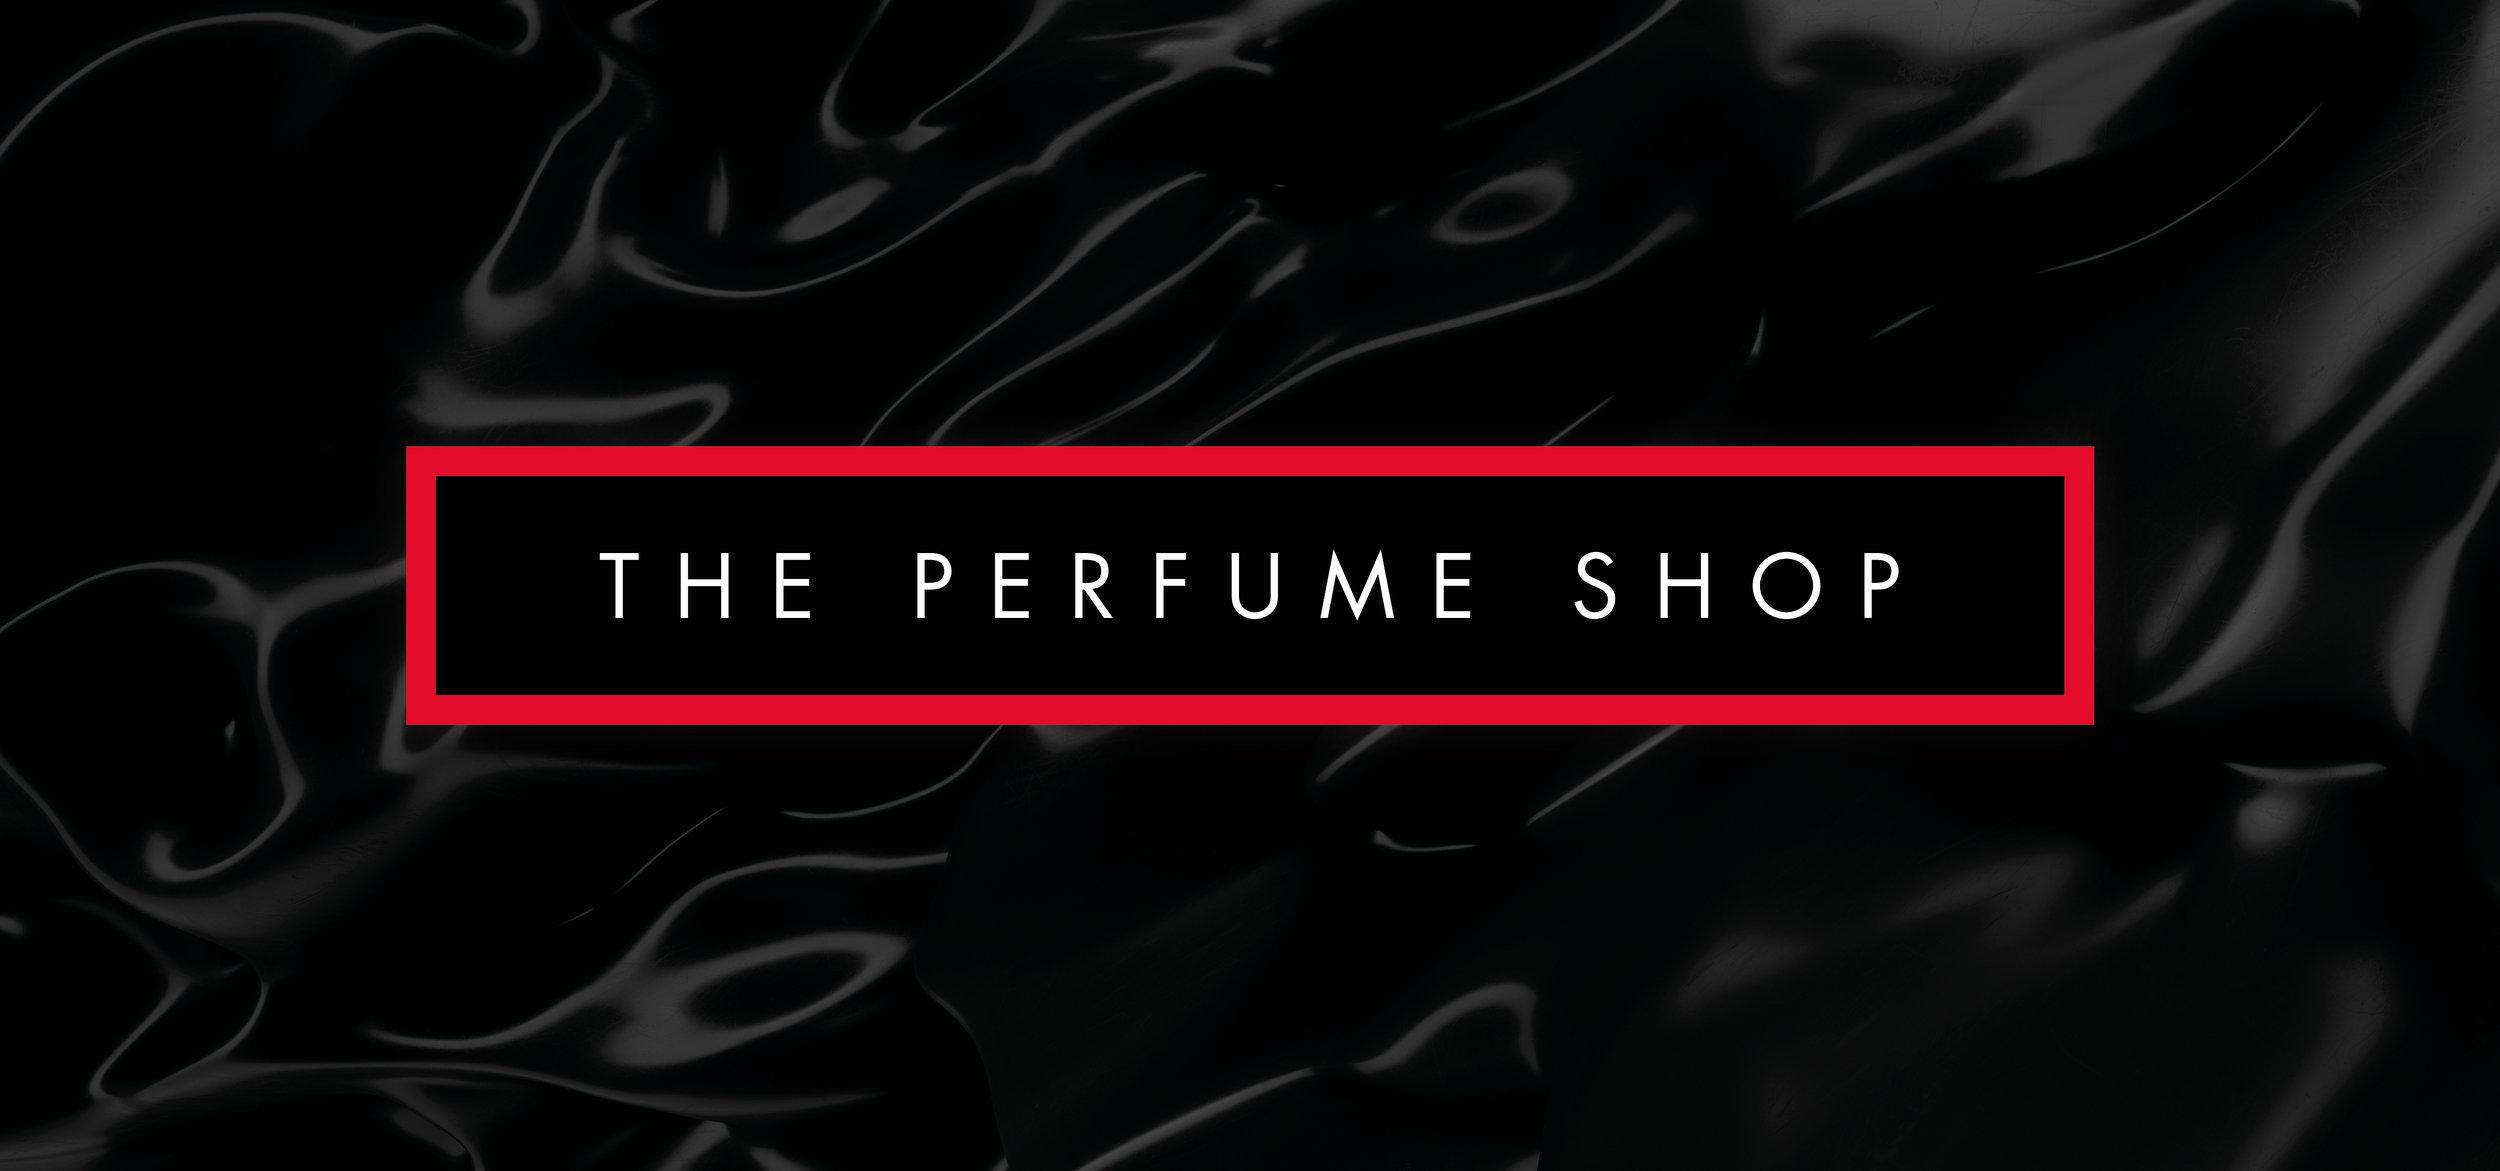 Cake_The Perfume Shop_Blog.jpg